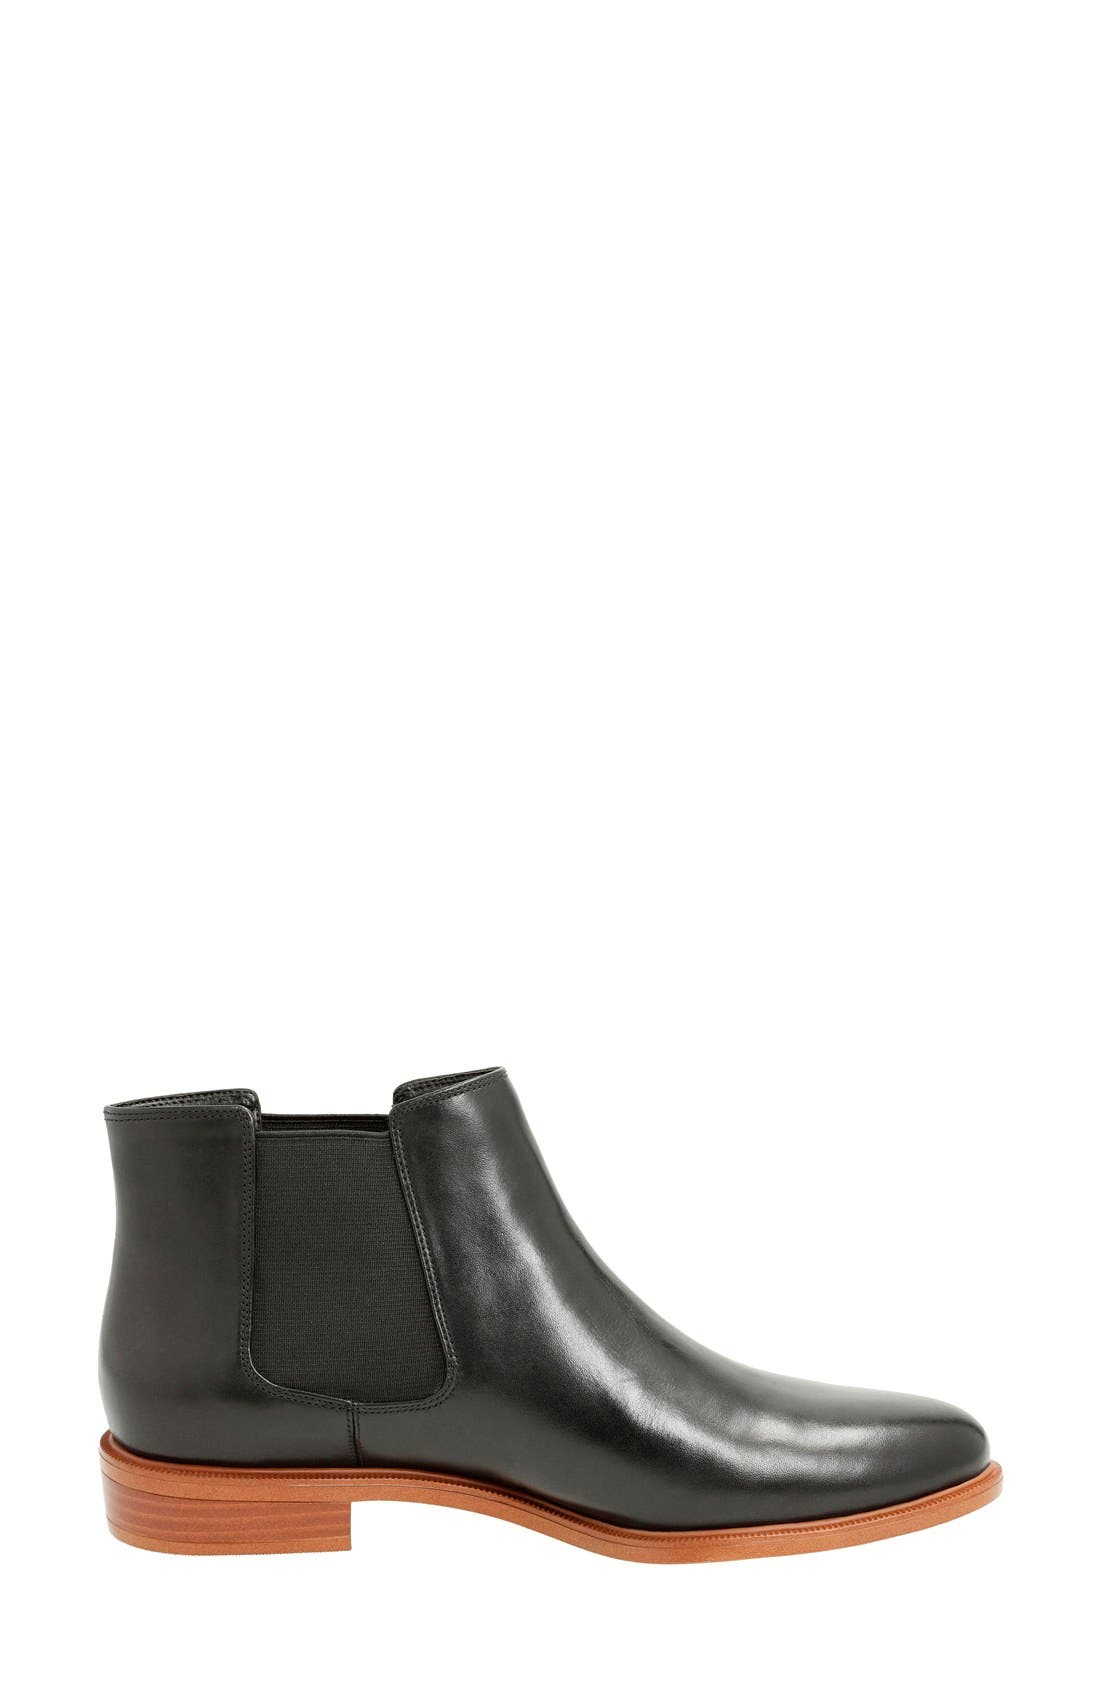 Alternate Image 2  - Clarks® 'Taylor Shine' Chelsea Boot (Women)